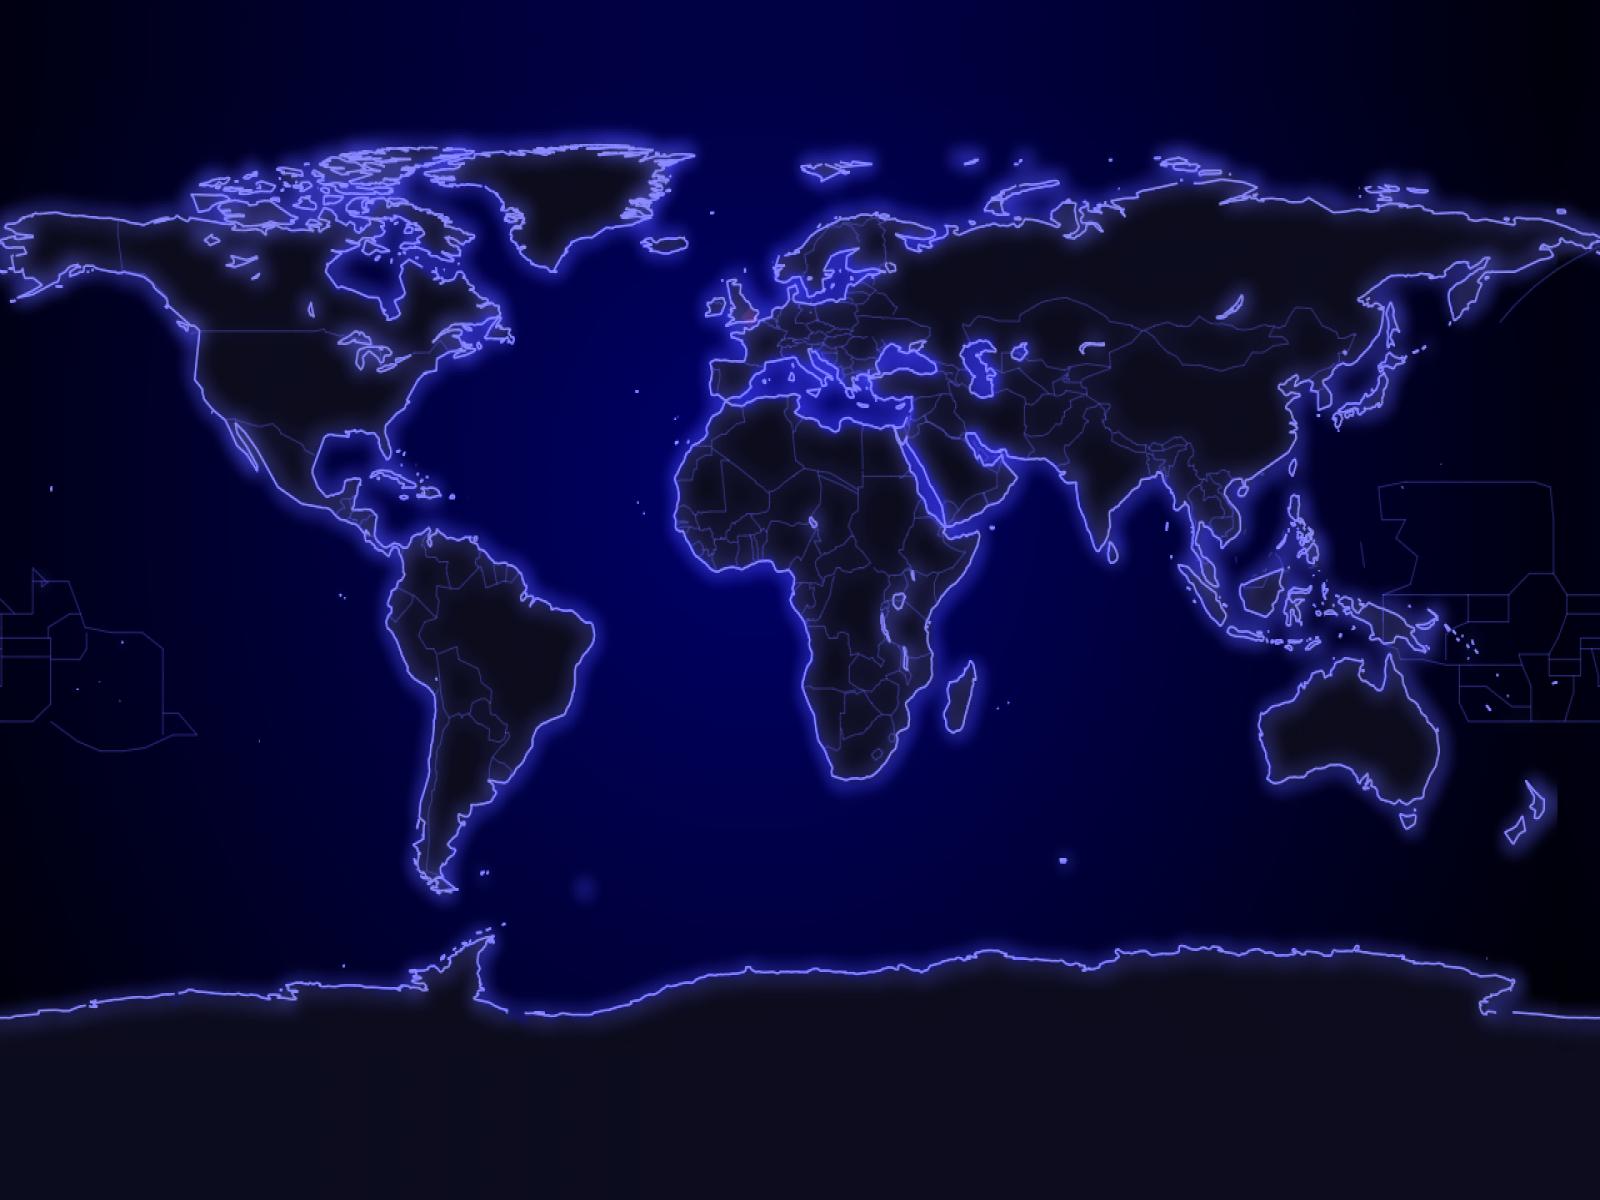 World map desktop wallpaper hd wallpapersafari 1600 x 1200 world map desktop wallpaper hd backgroundjpg 16001200 1600x1200 gumiabroncs Gallery